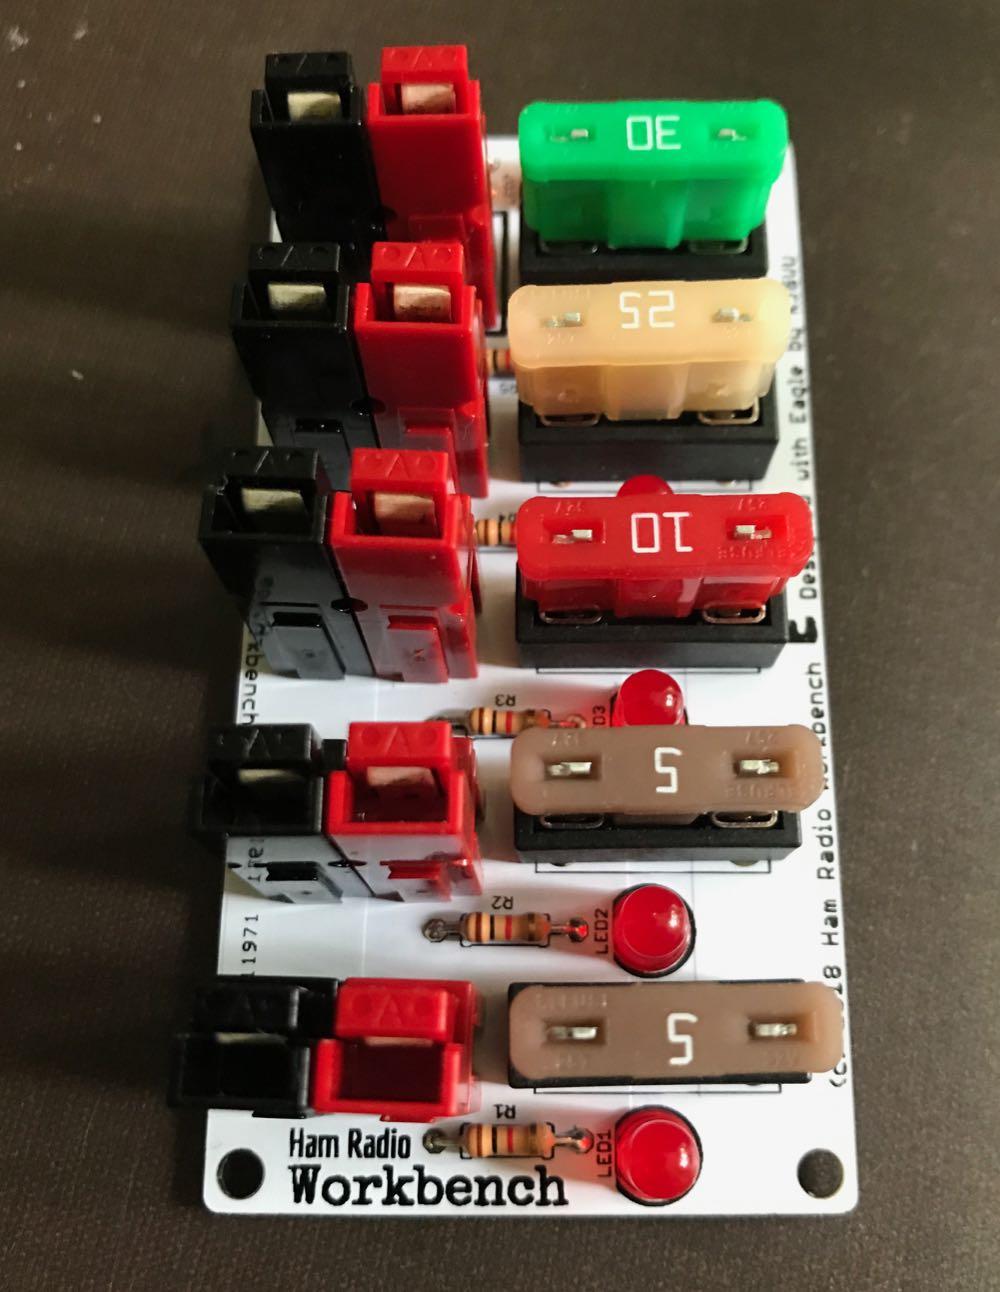 The Ham Radio Workbench 12 VDC Power Distribution Strip Kit